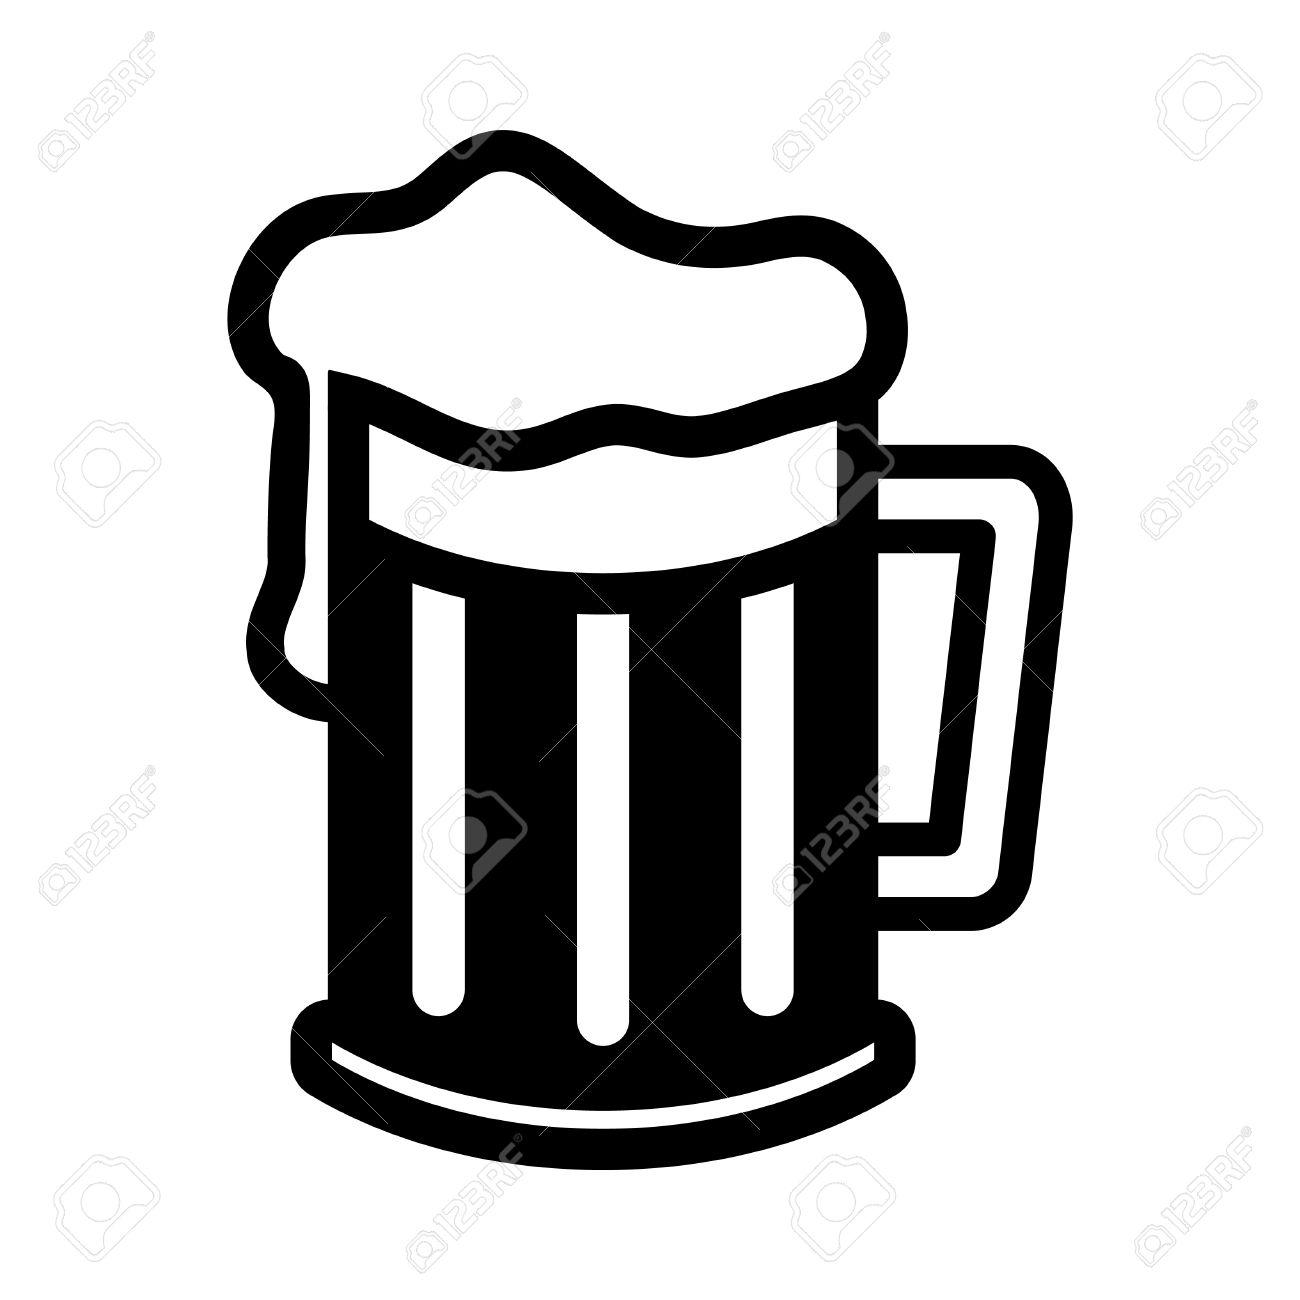 beer mug vector icon royalty free cliparts vectors and stock rh 123rf com beer vector mechanics solutions beer vector mechanics solutions pdf